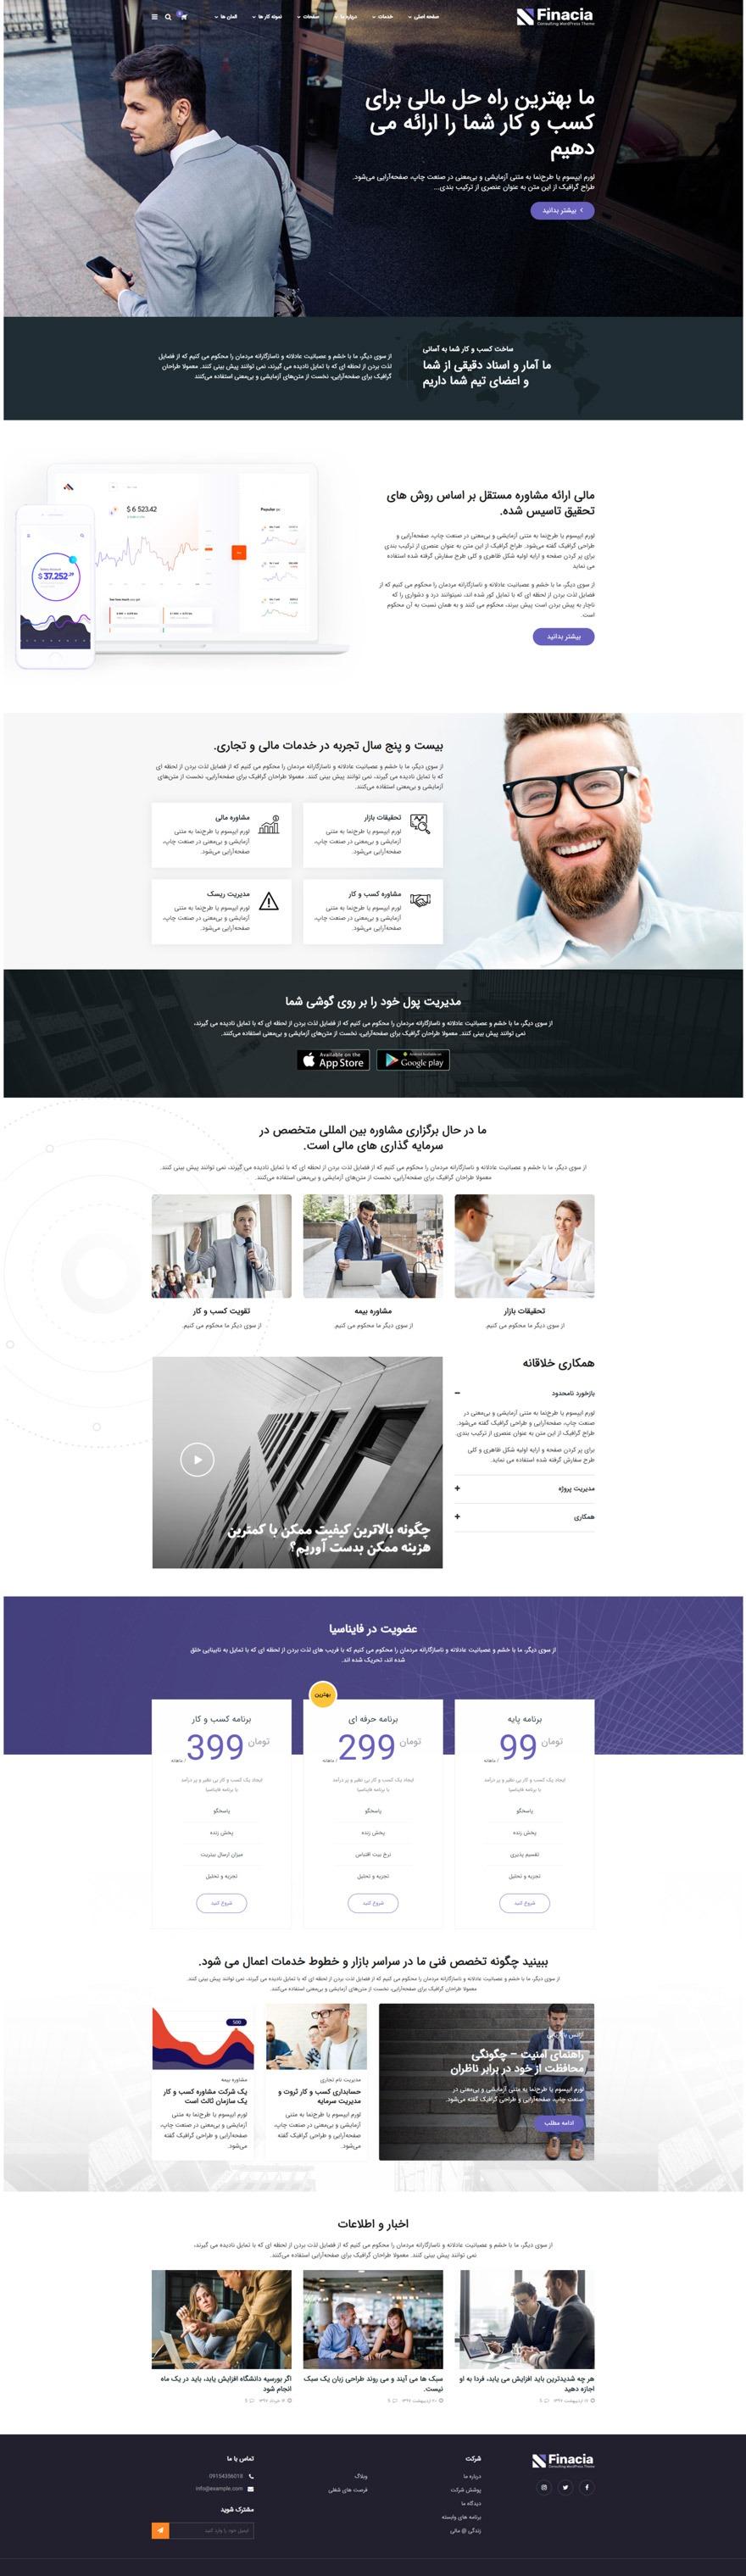 طراحی سایت مدیریت مالی